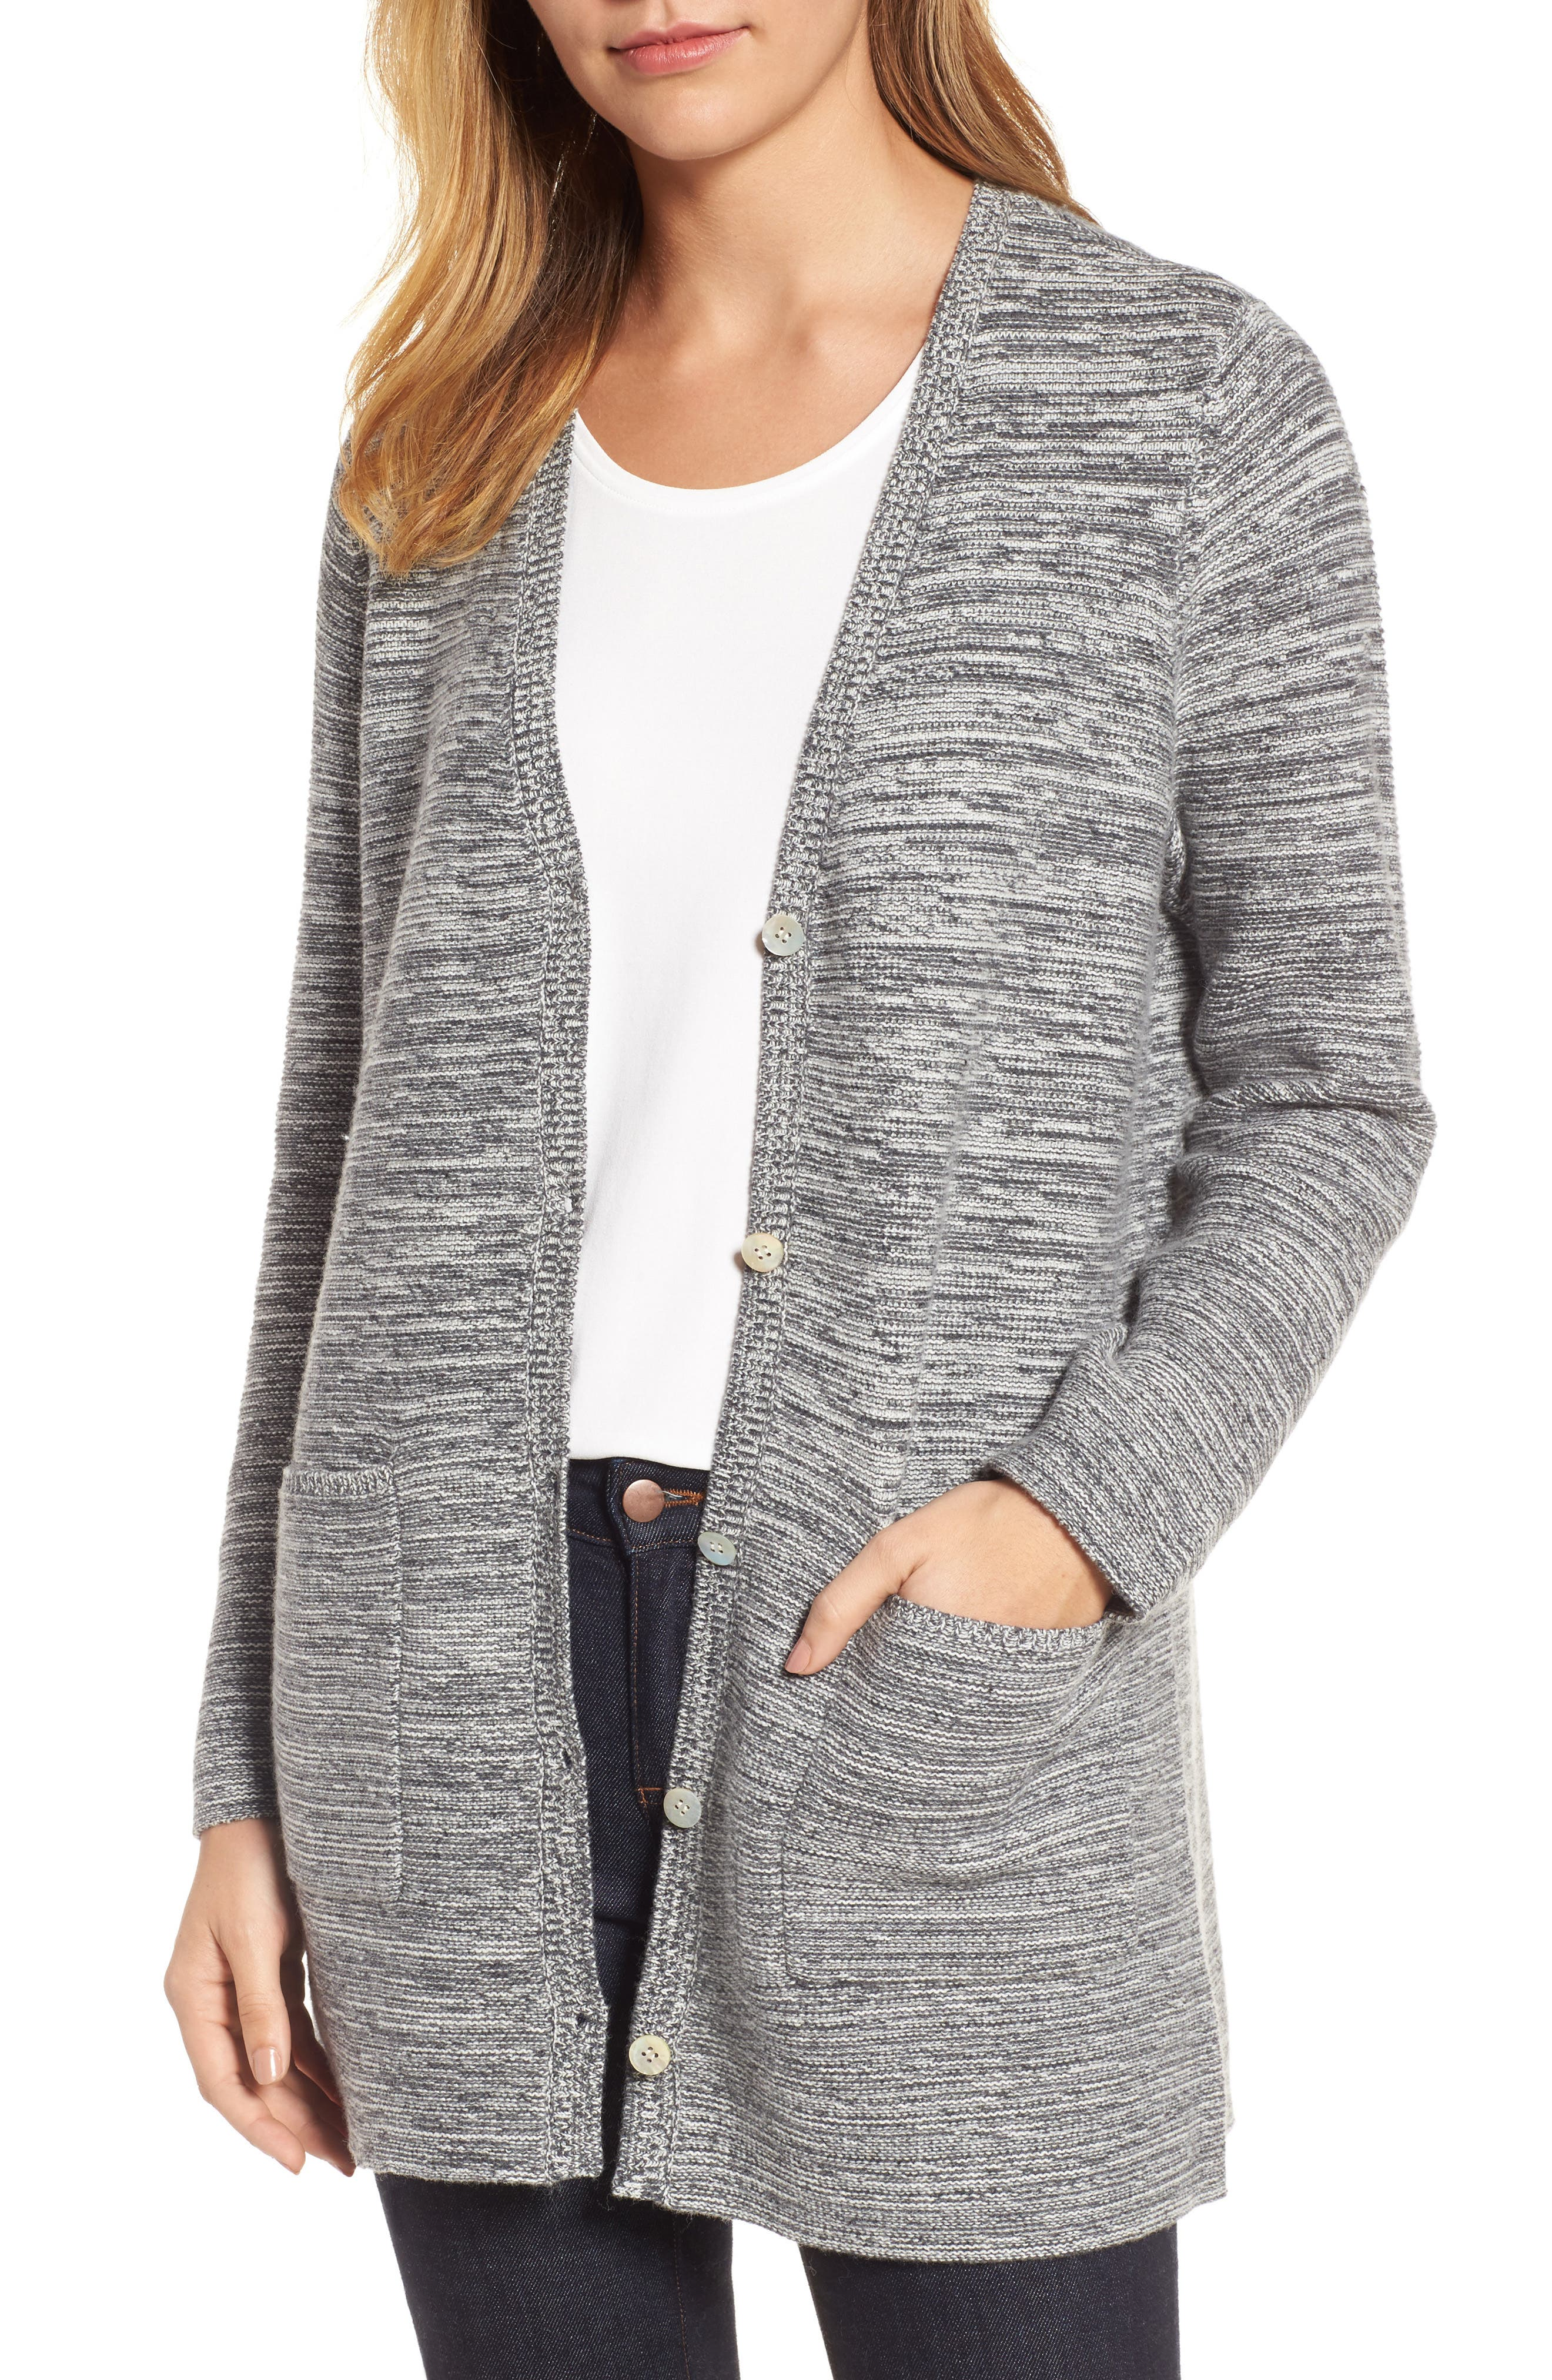 Alternate Image 1 Selected - Eileen Fisher Organic Cotton Blend Boyfriend Cardigan